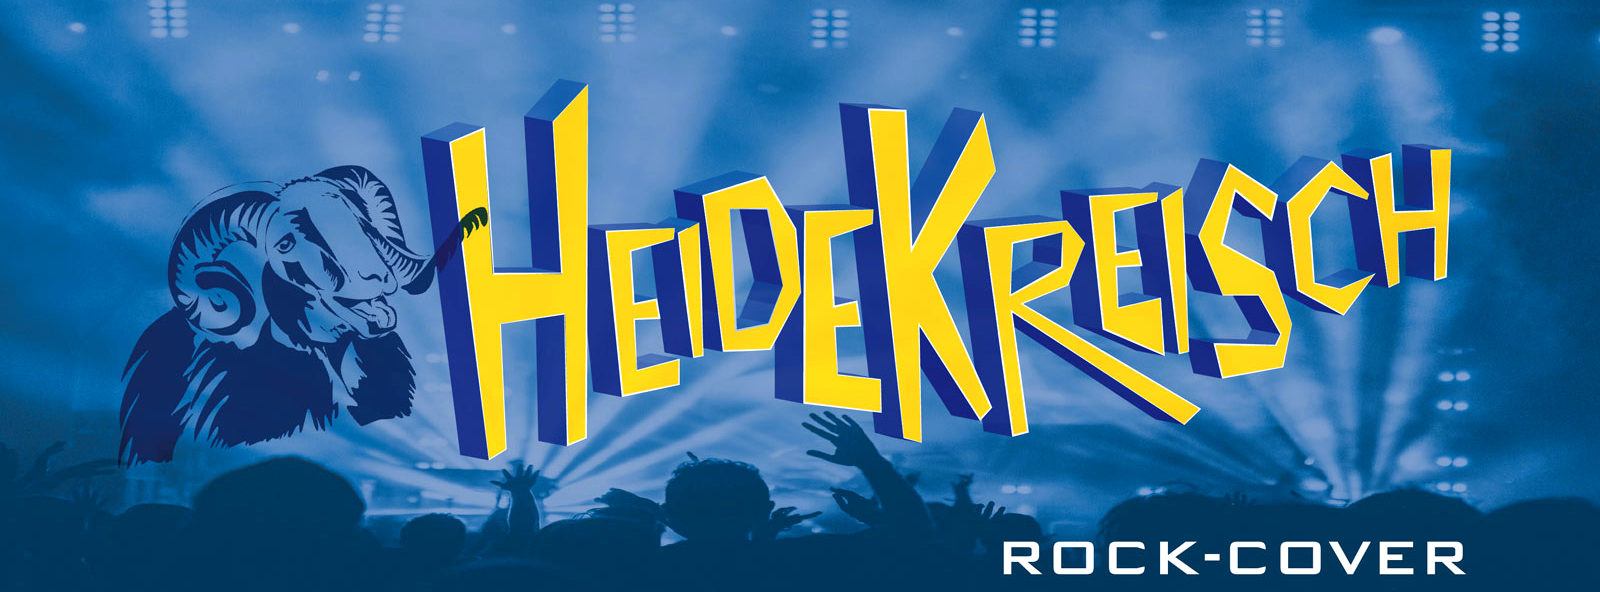 Heidekreisch – Rock-Cover im Norden